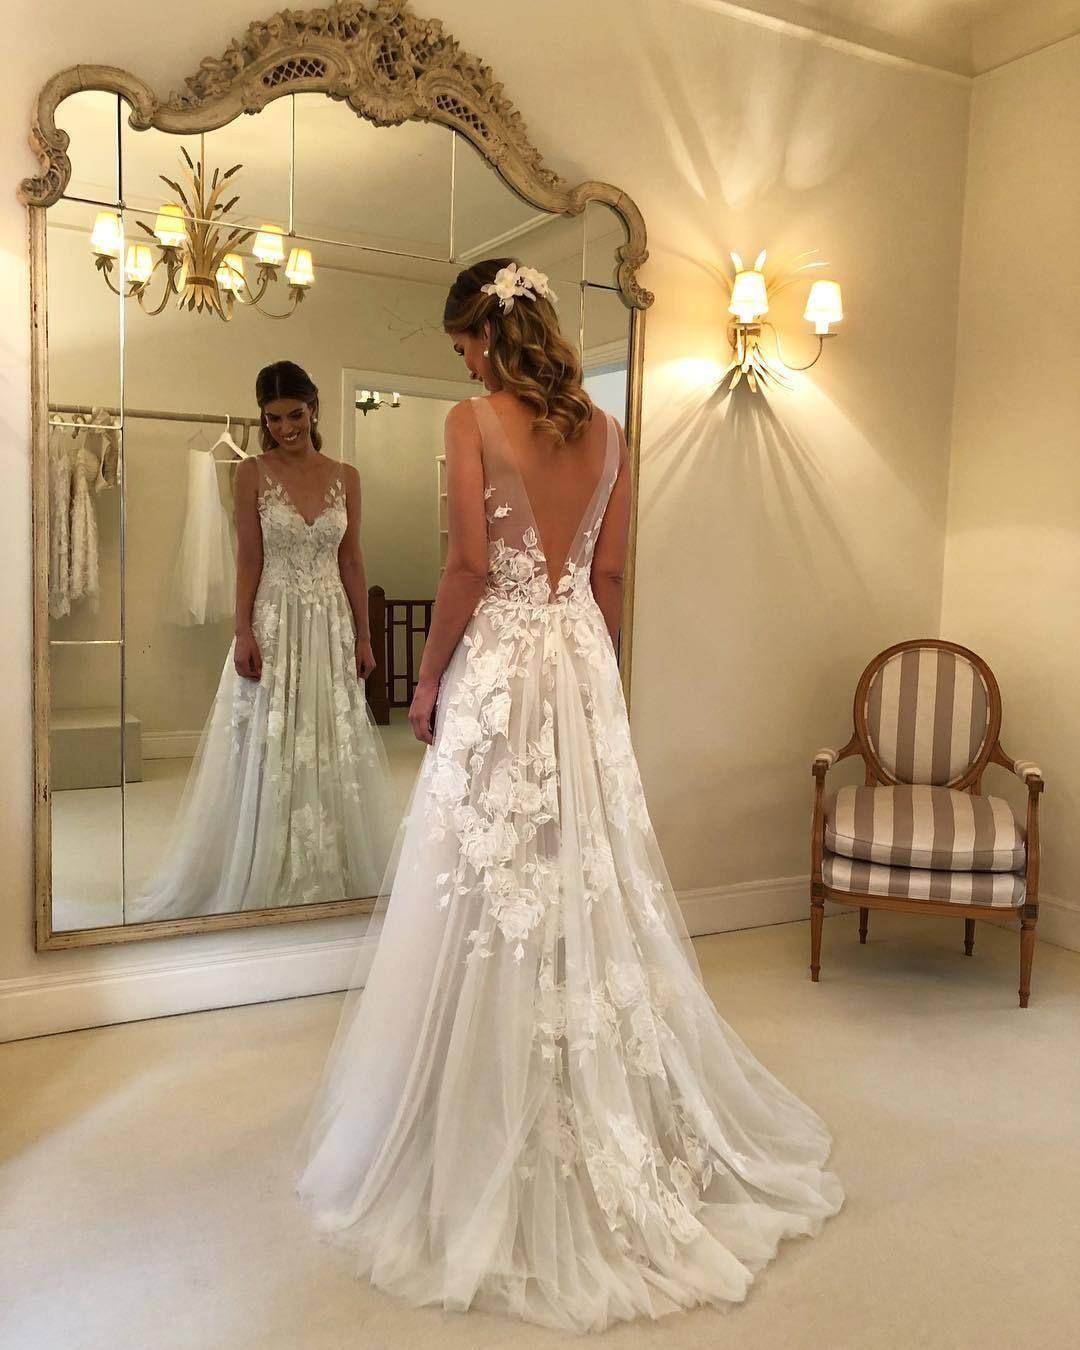 Custom wedding dress designers  Wonderful Tulle Vneck Neckline Aline Wedding Dresses With